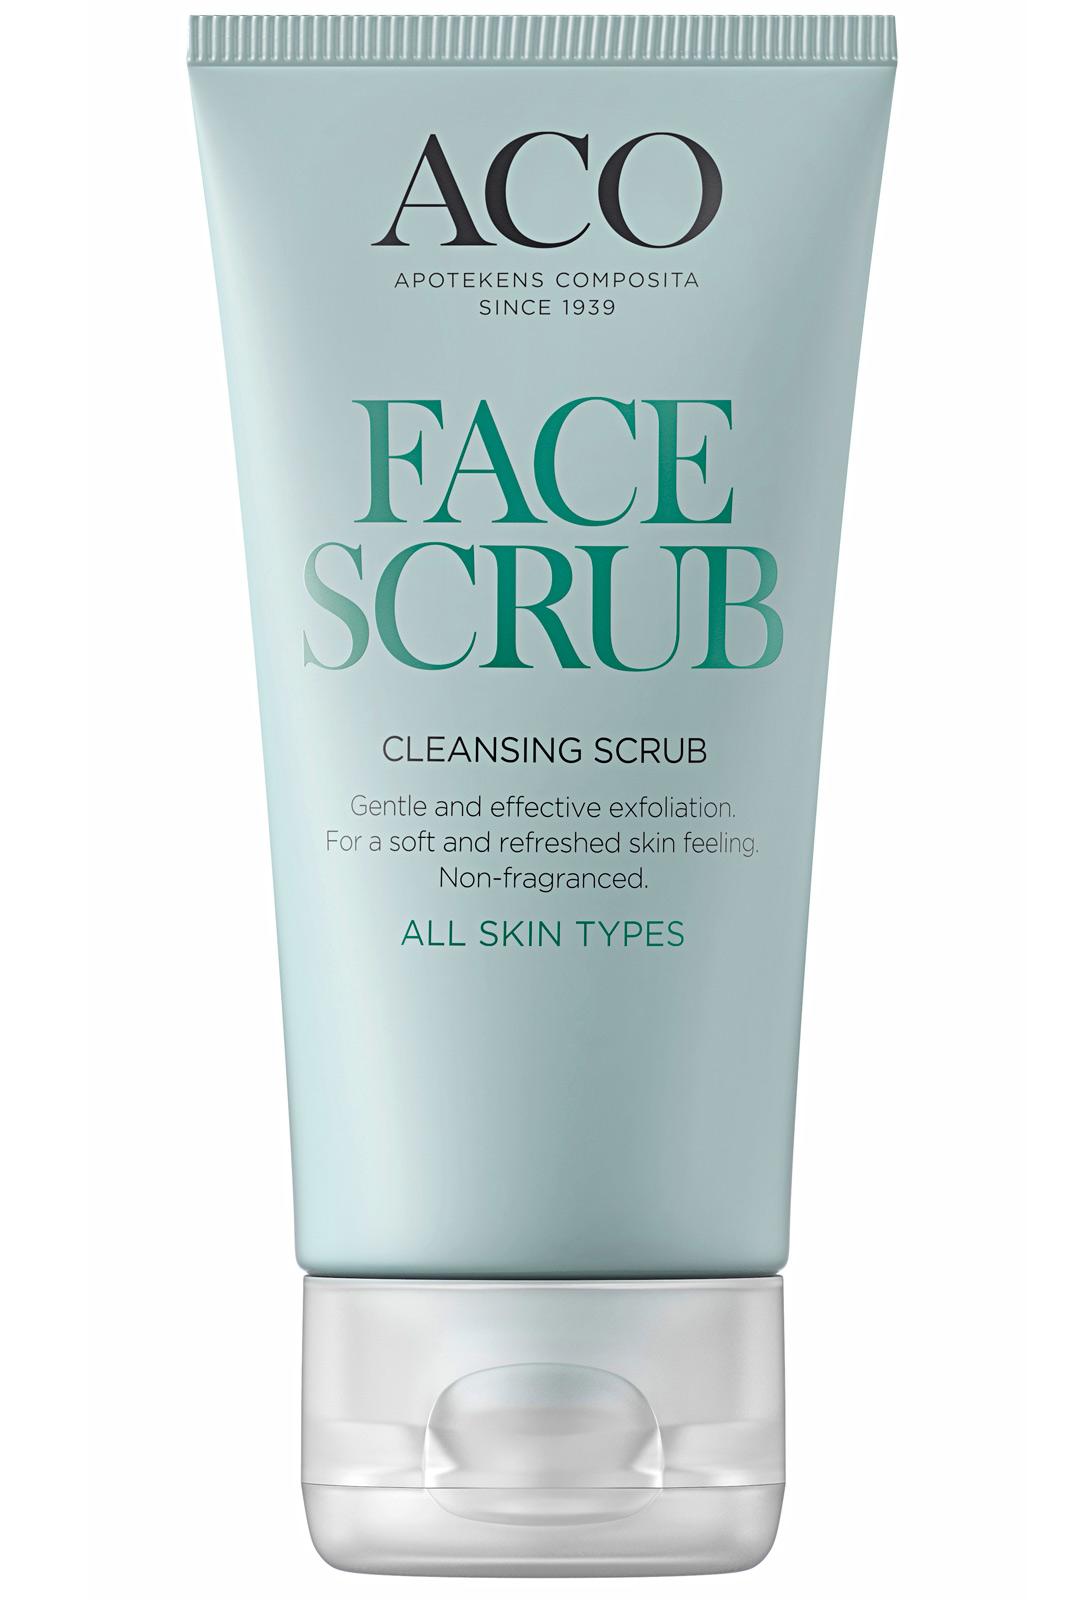 Aco Face Cleansing Scrub With Bambu 9,10 €/50 ml.